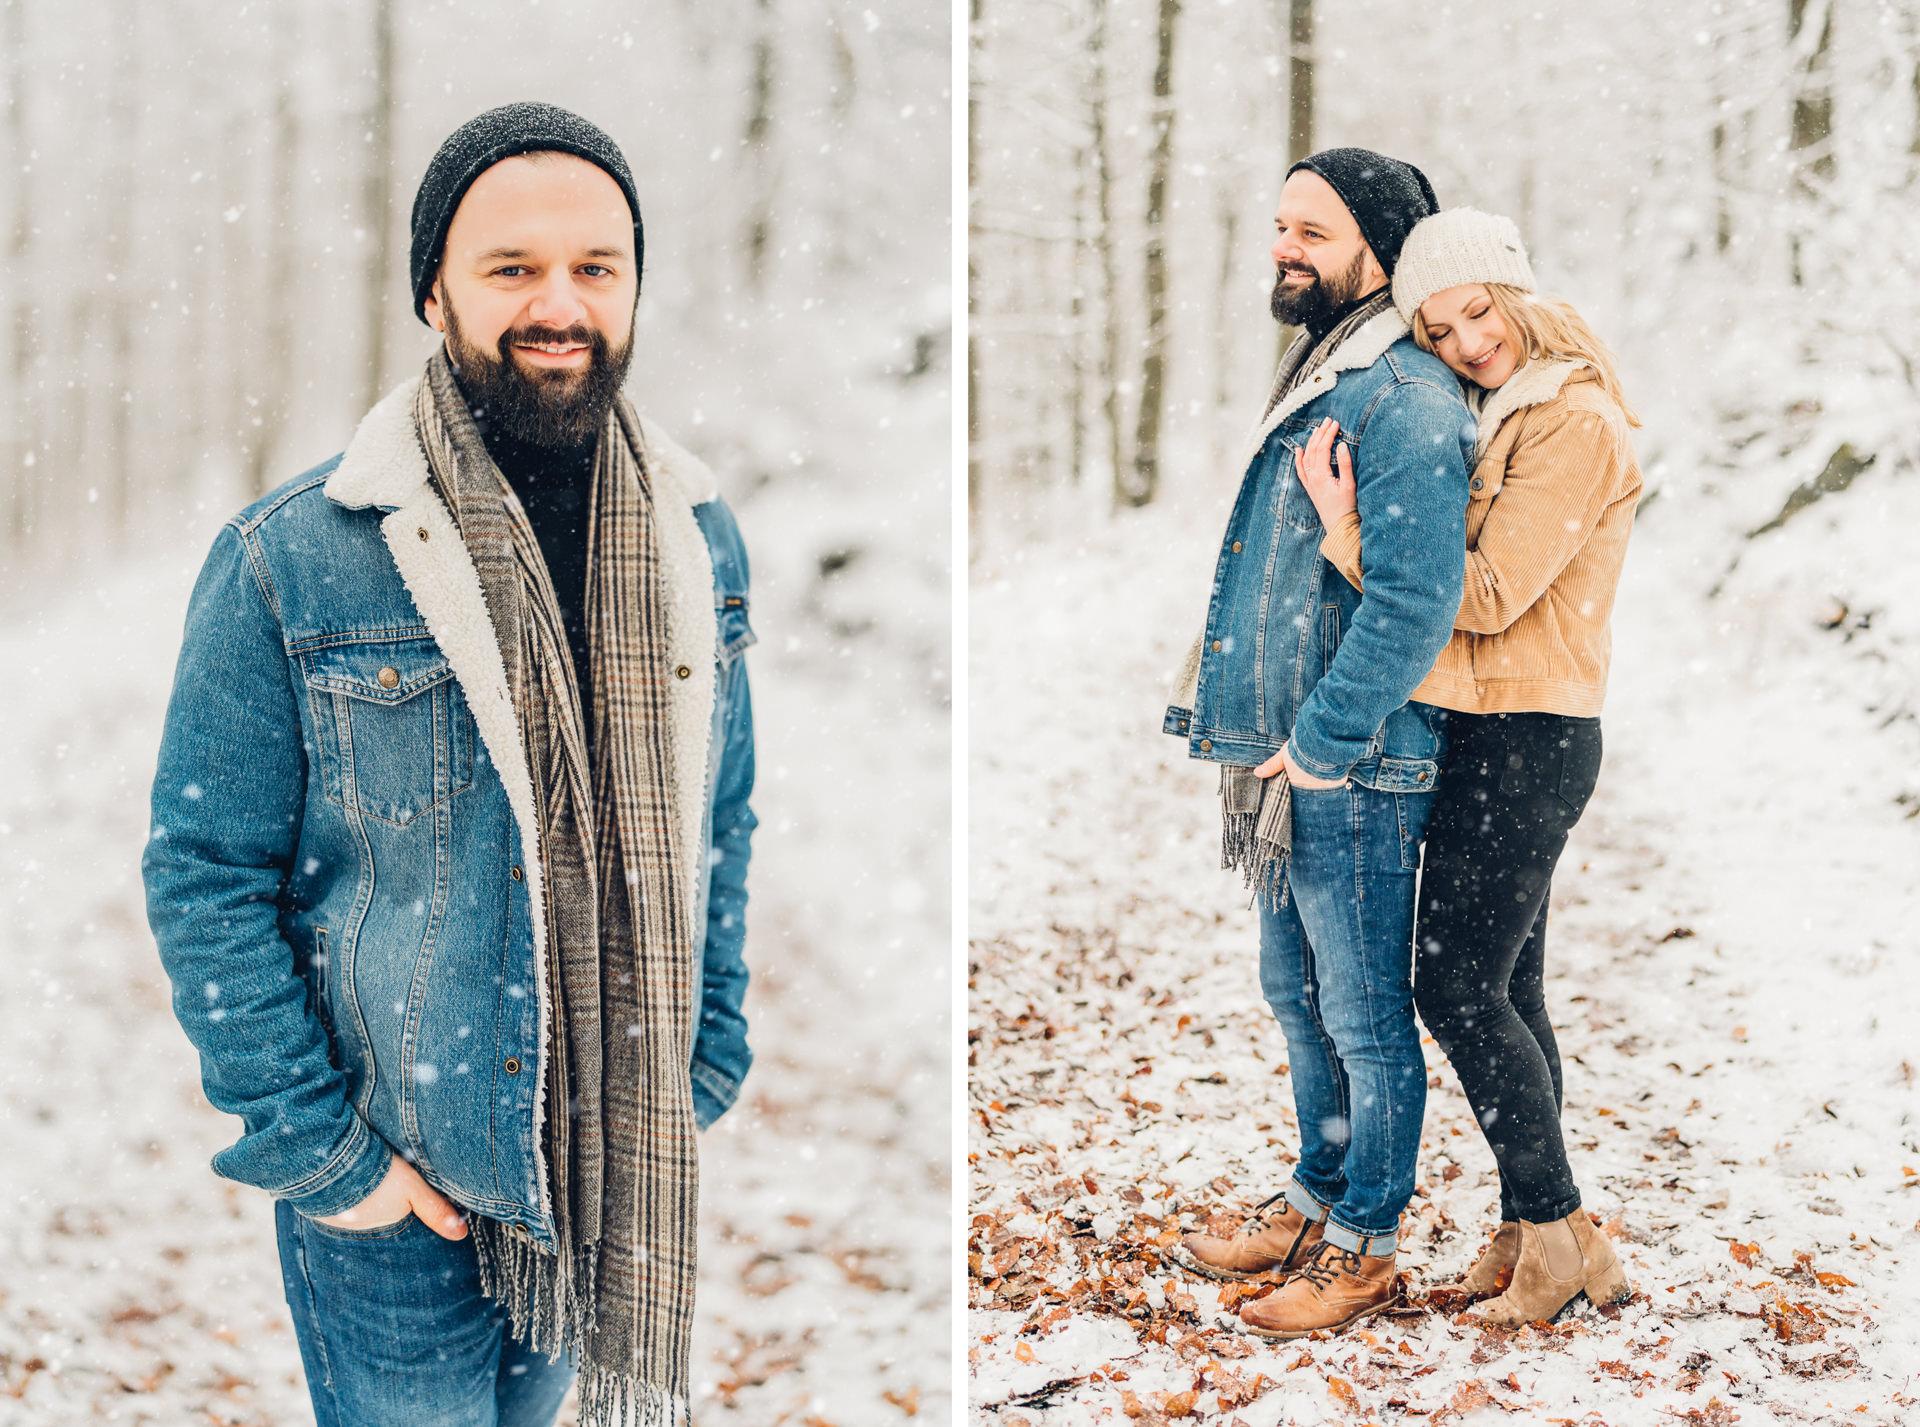 Pärchenshooting im Schnee im Pfälzer Wald